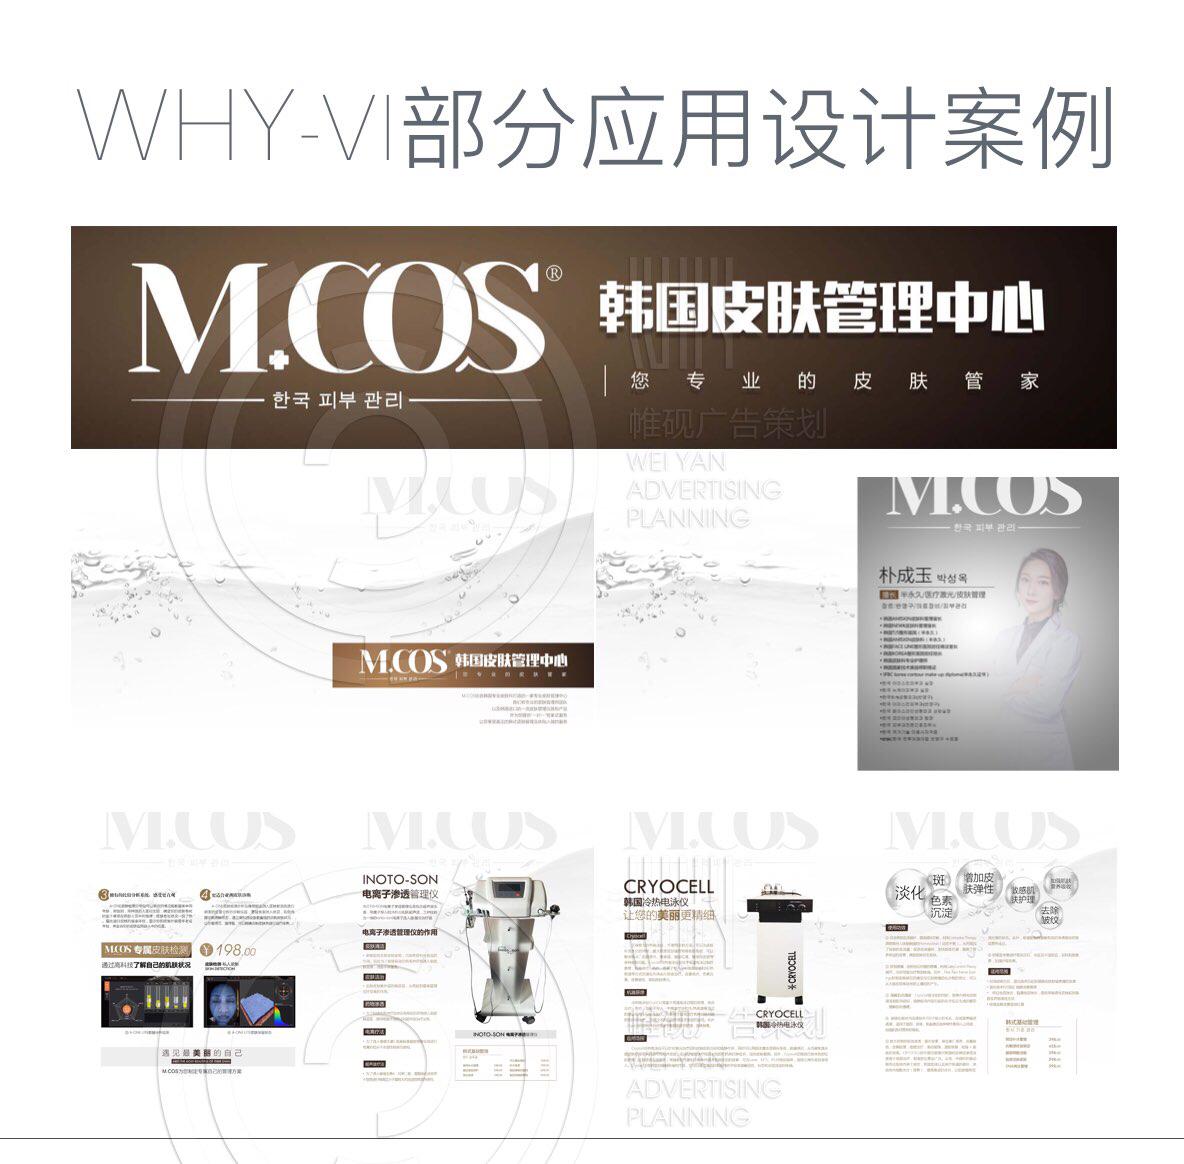 MCOS美容机构VI视觉识别系统